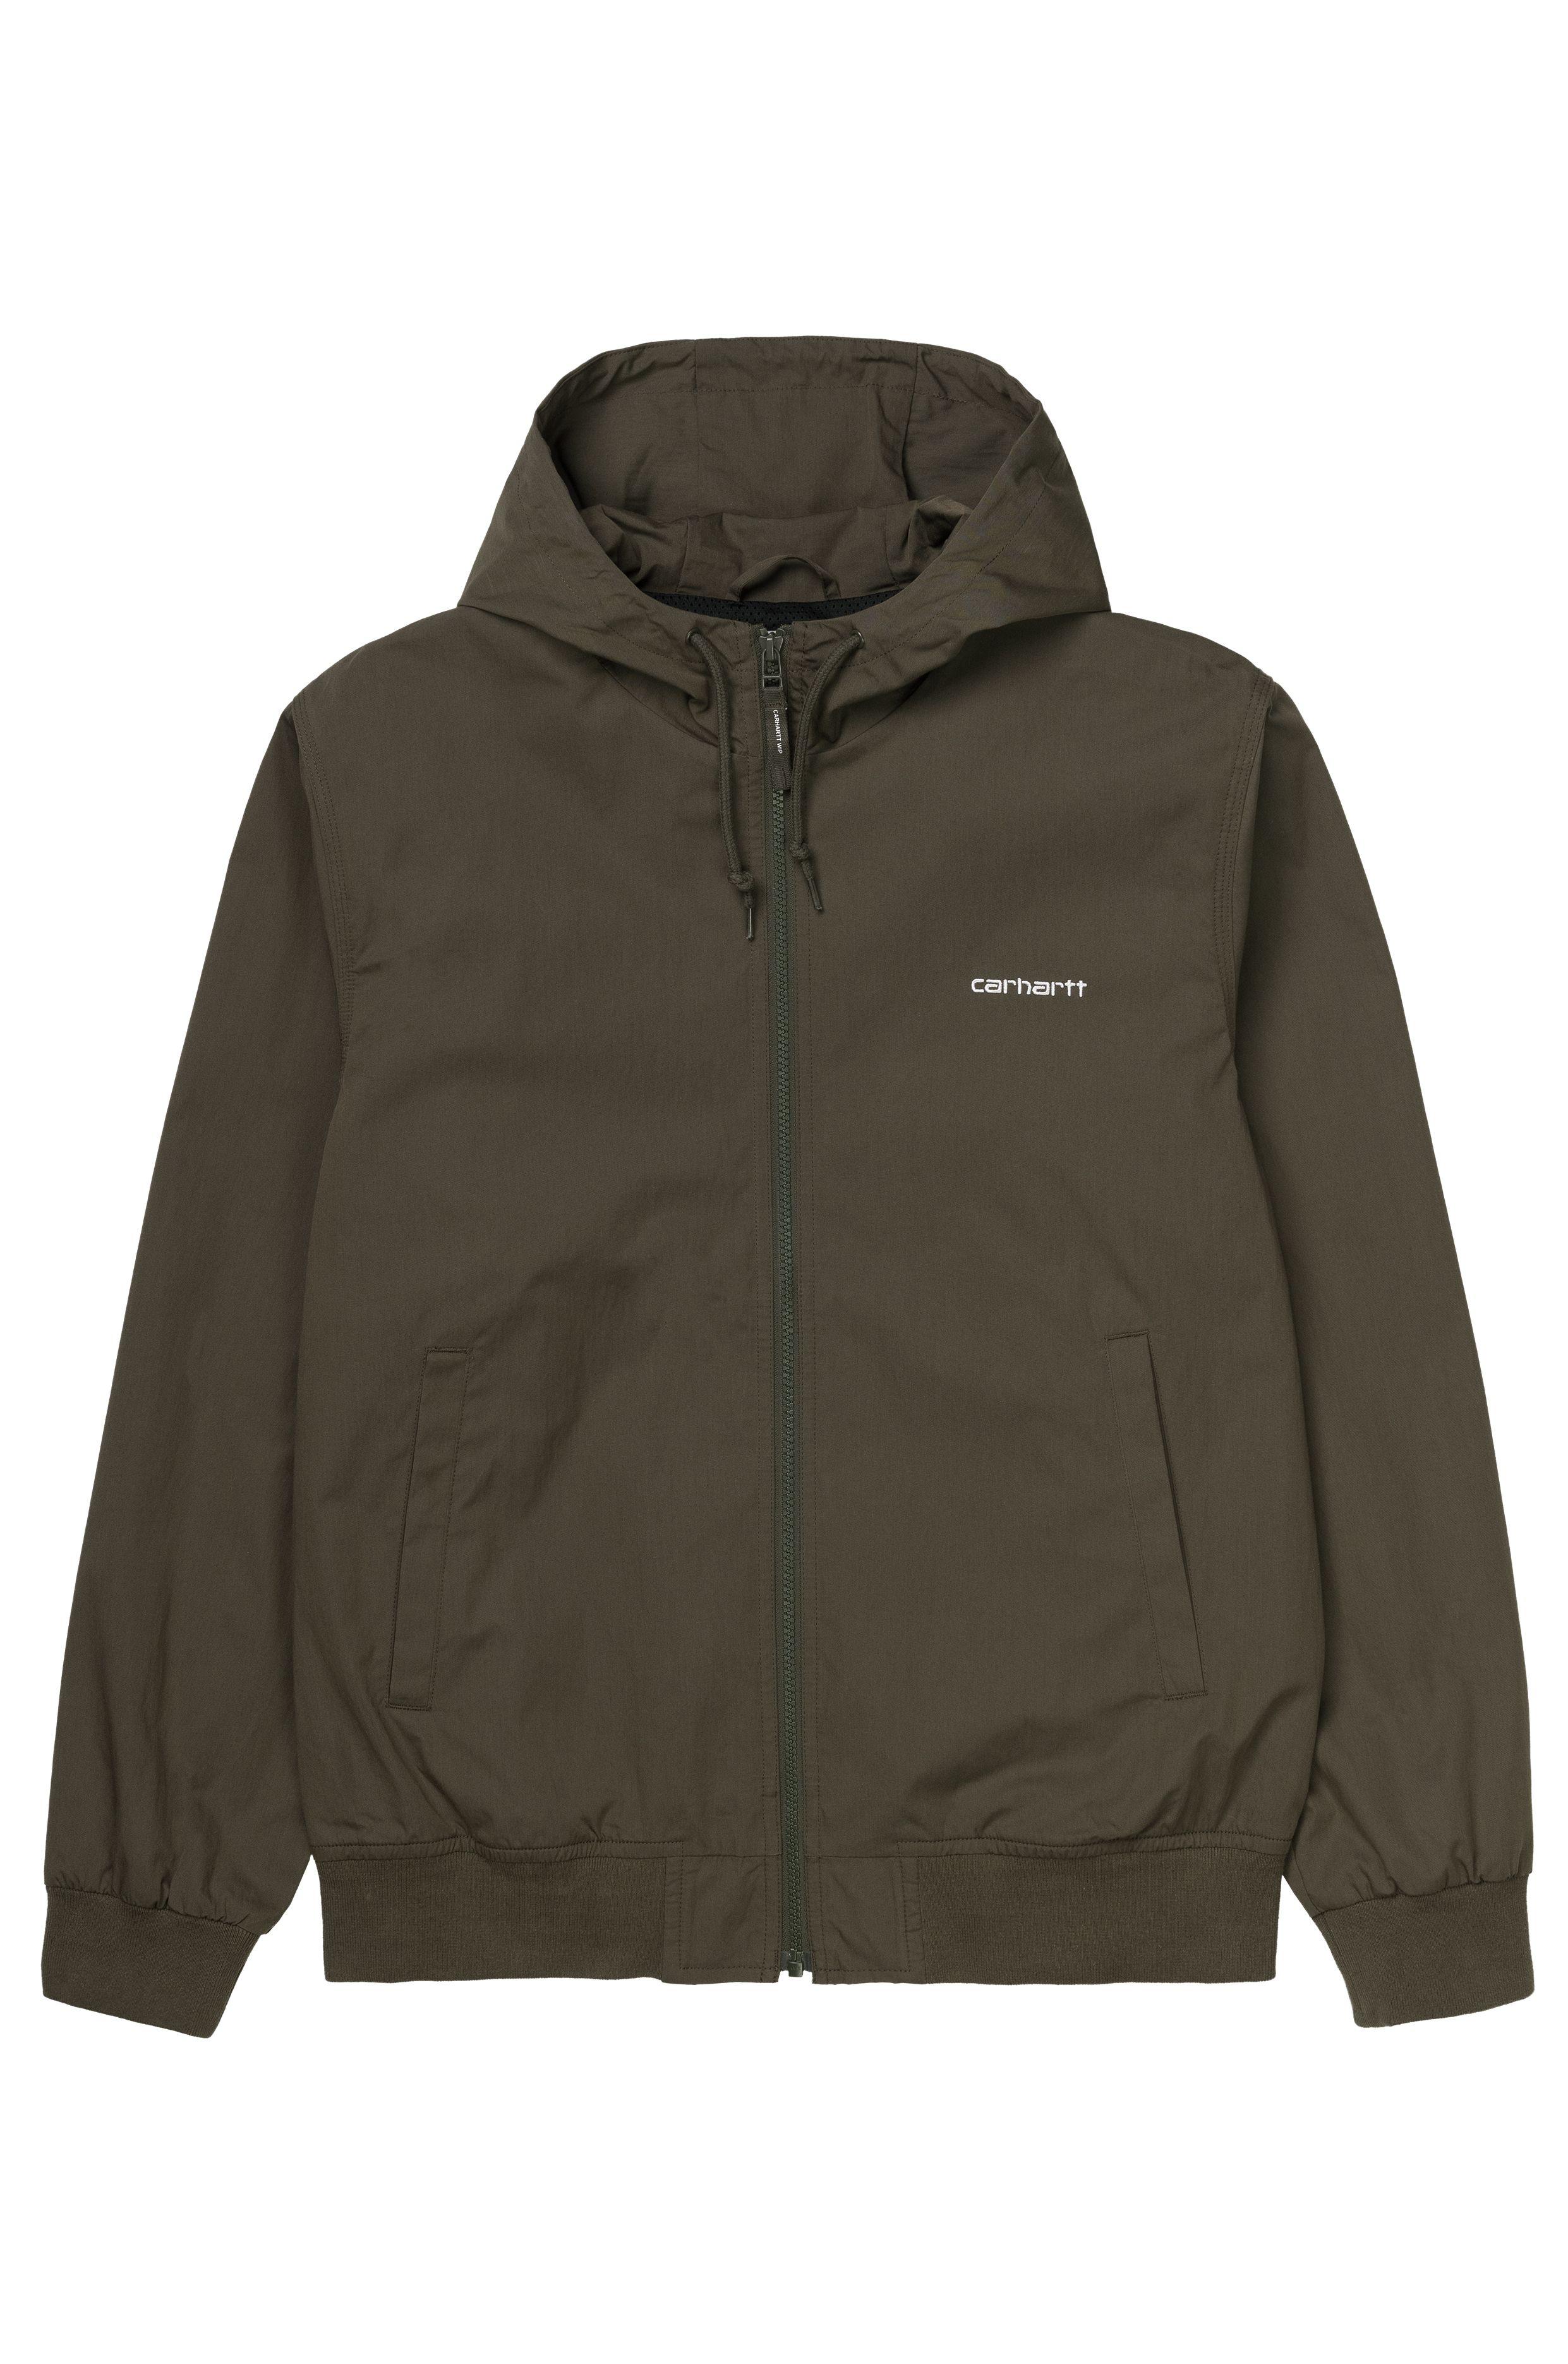 Carhartt WIP Jacket MARSH JACKET Cypress/White